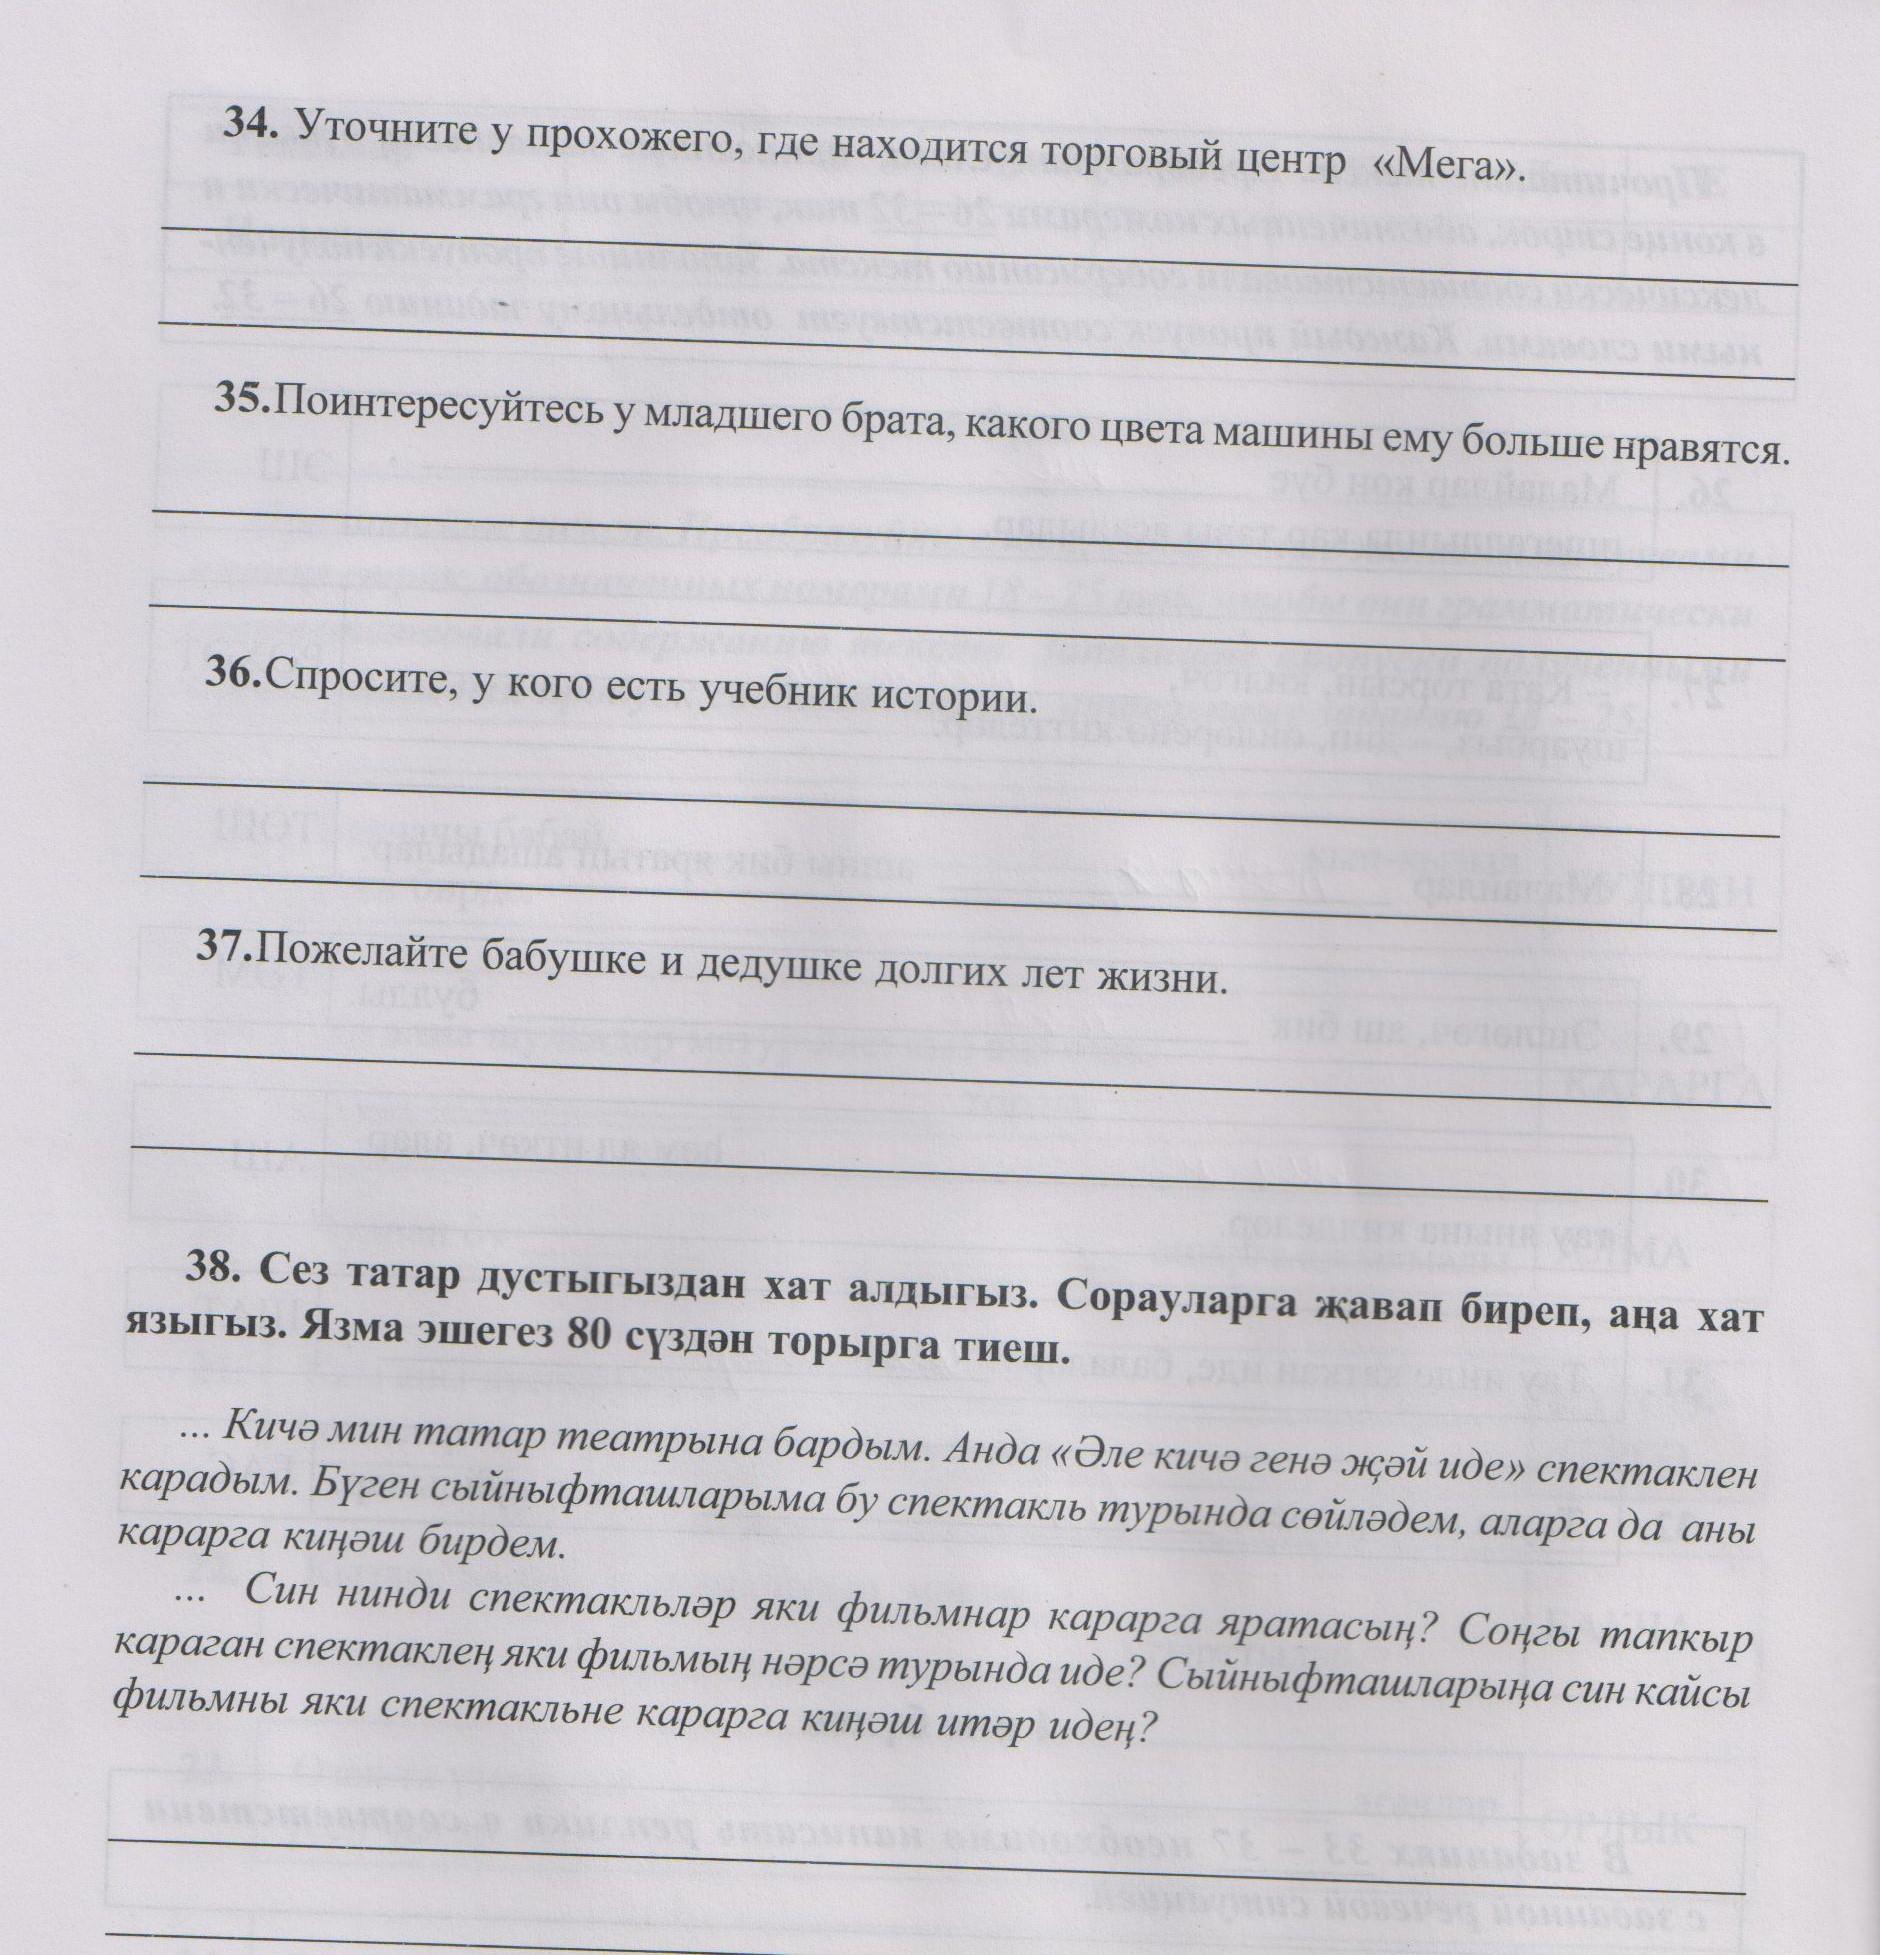 Демоверсия для ЕРТ по татарскому языку hello html 497f9c0c jpg